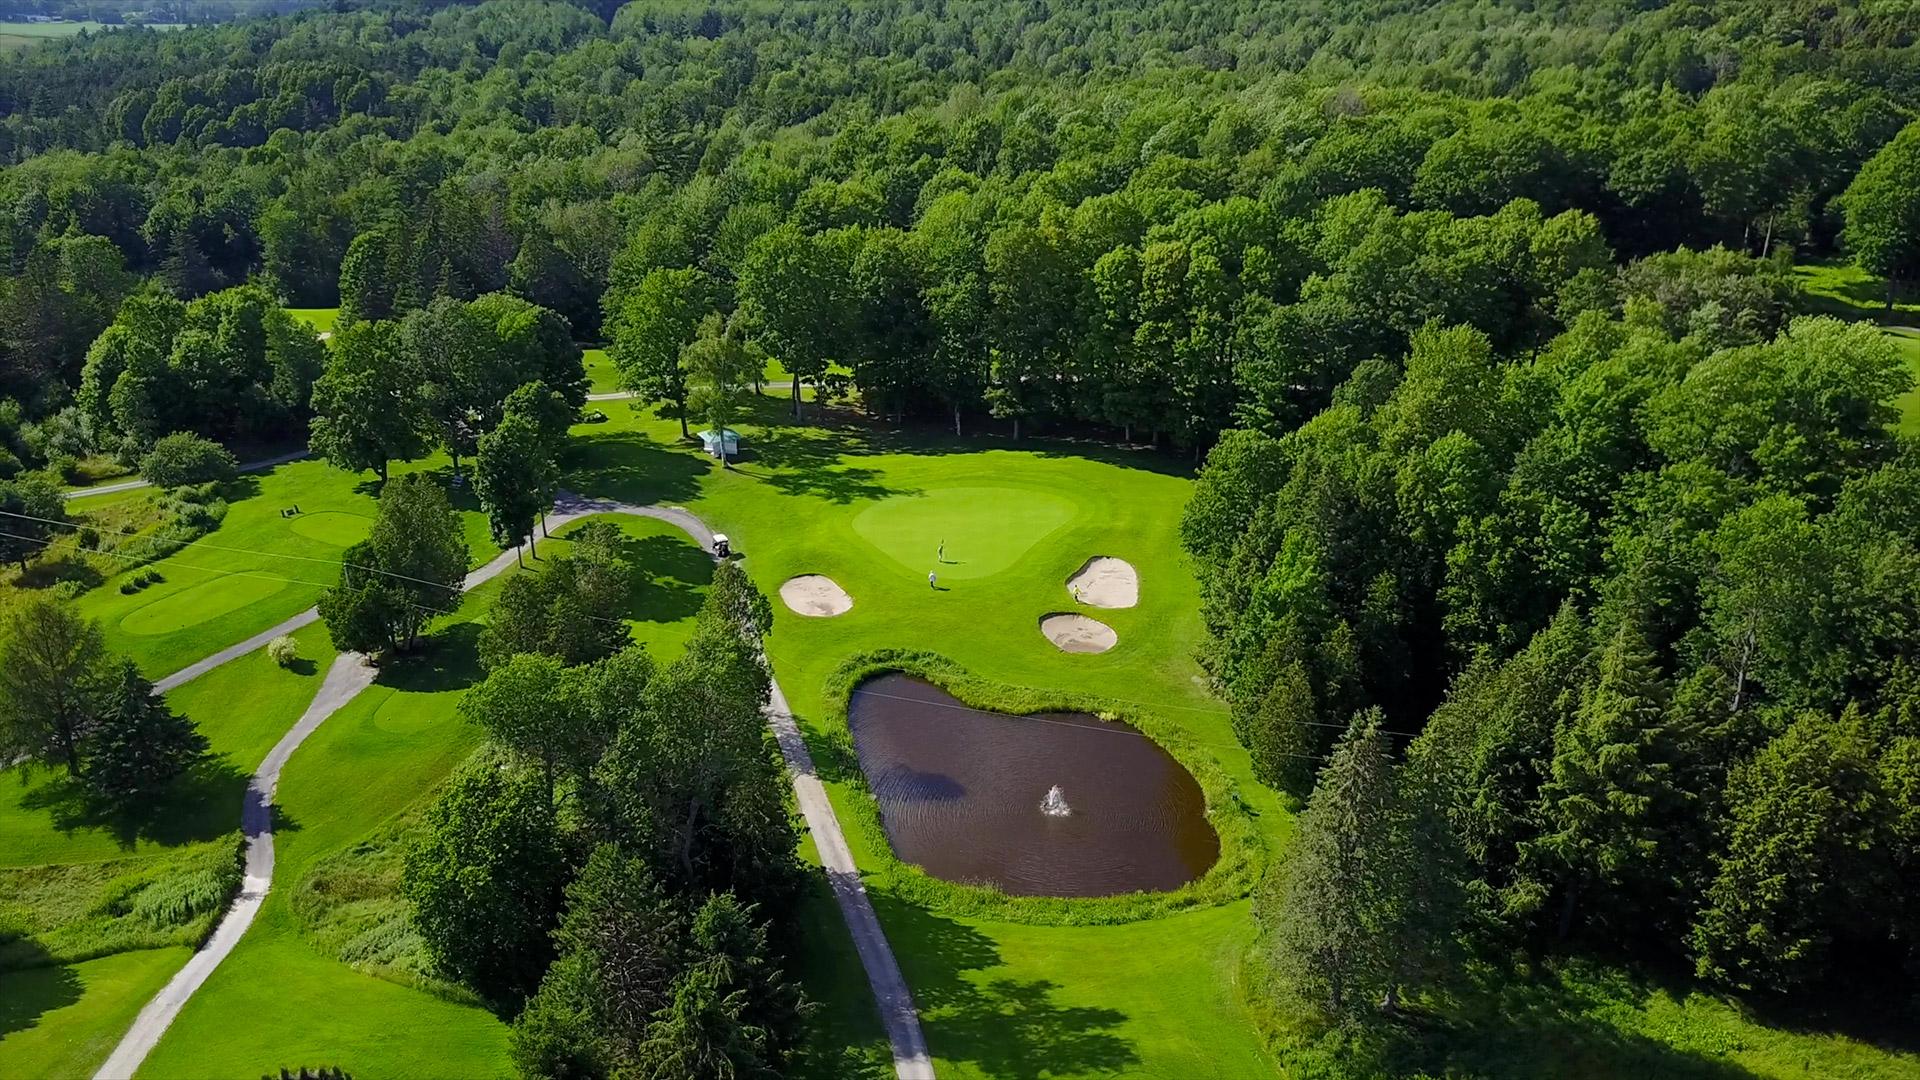 Noël 2020 - DuoGolf - Club de golf Milby